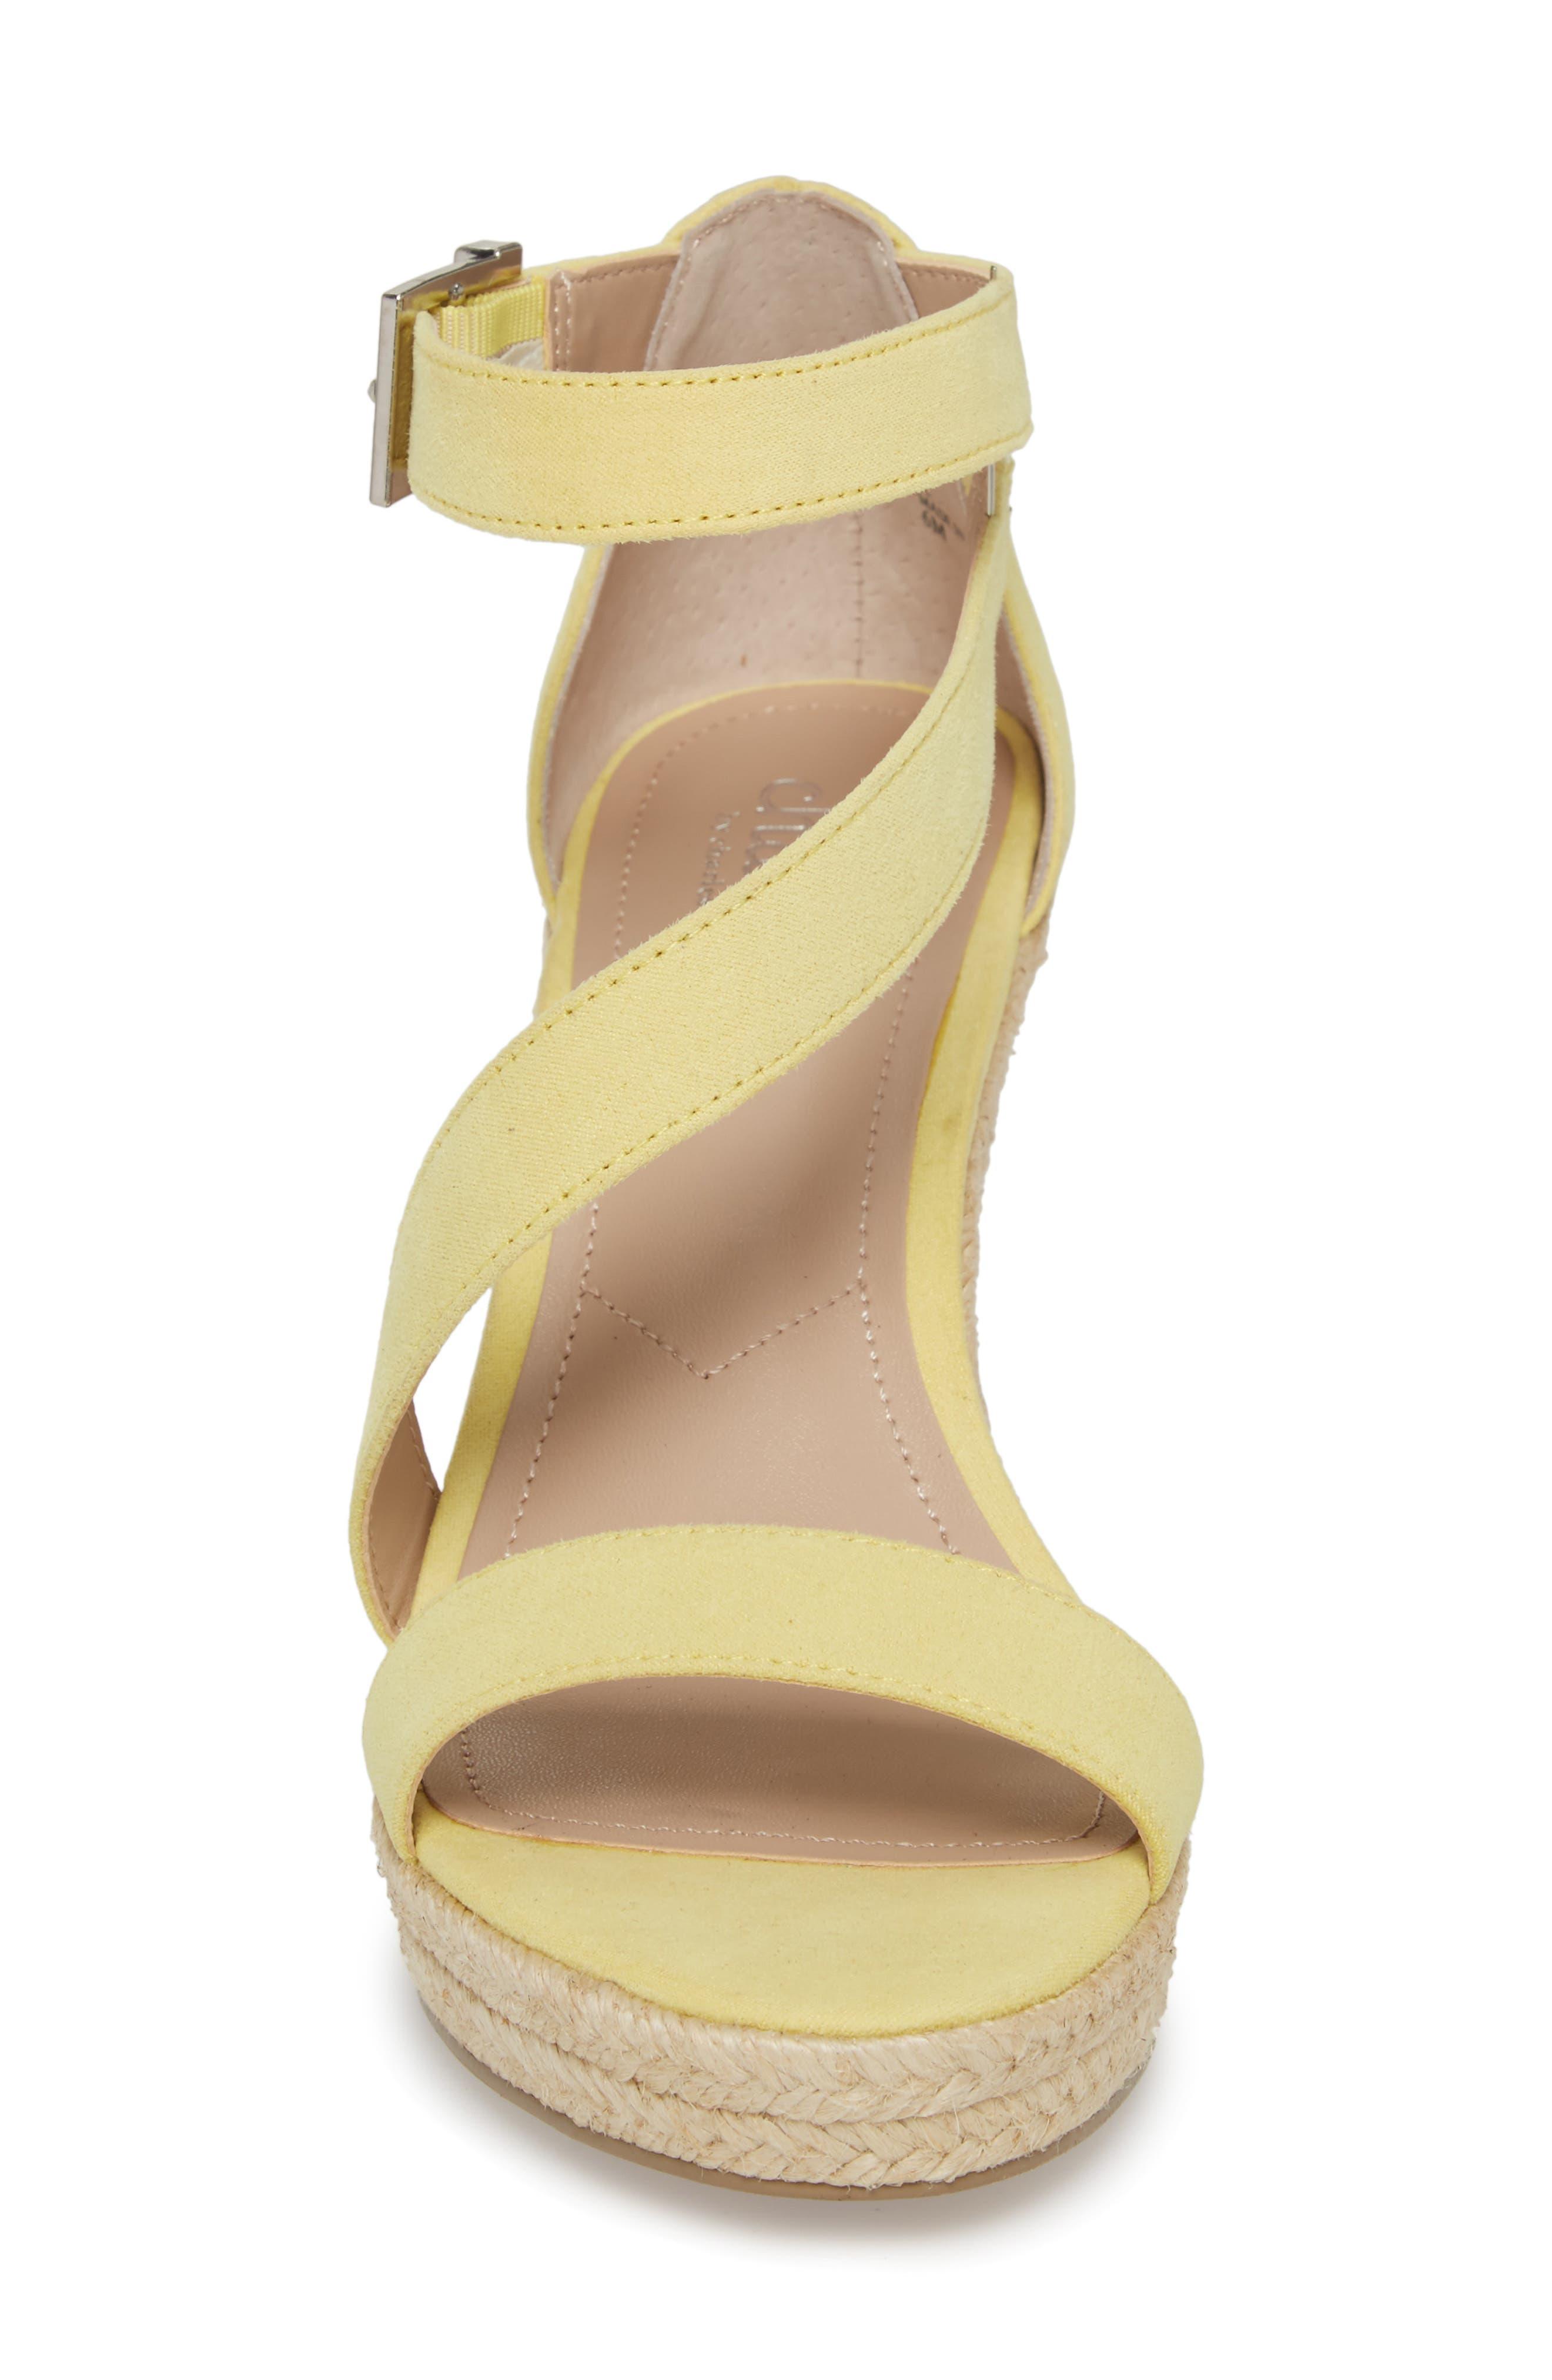 Lou Asymmetrical Wedge Sandal,                             Alternate thumbnail 4, color,                             BUTTERCUP SUEDE